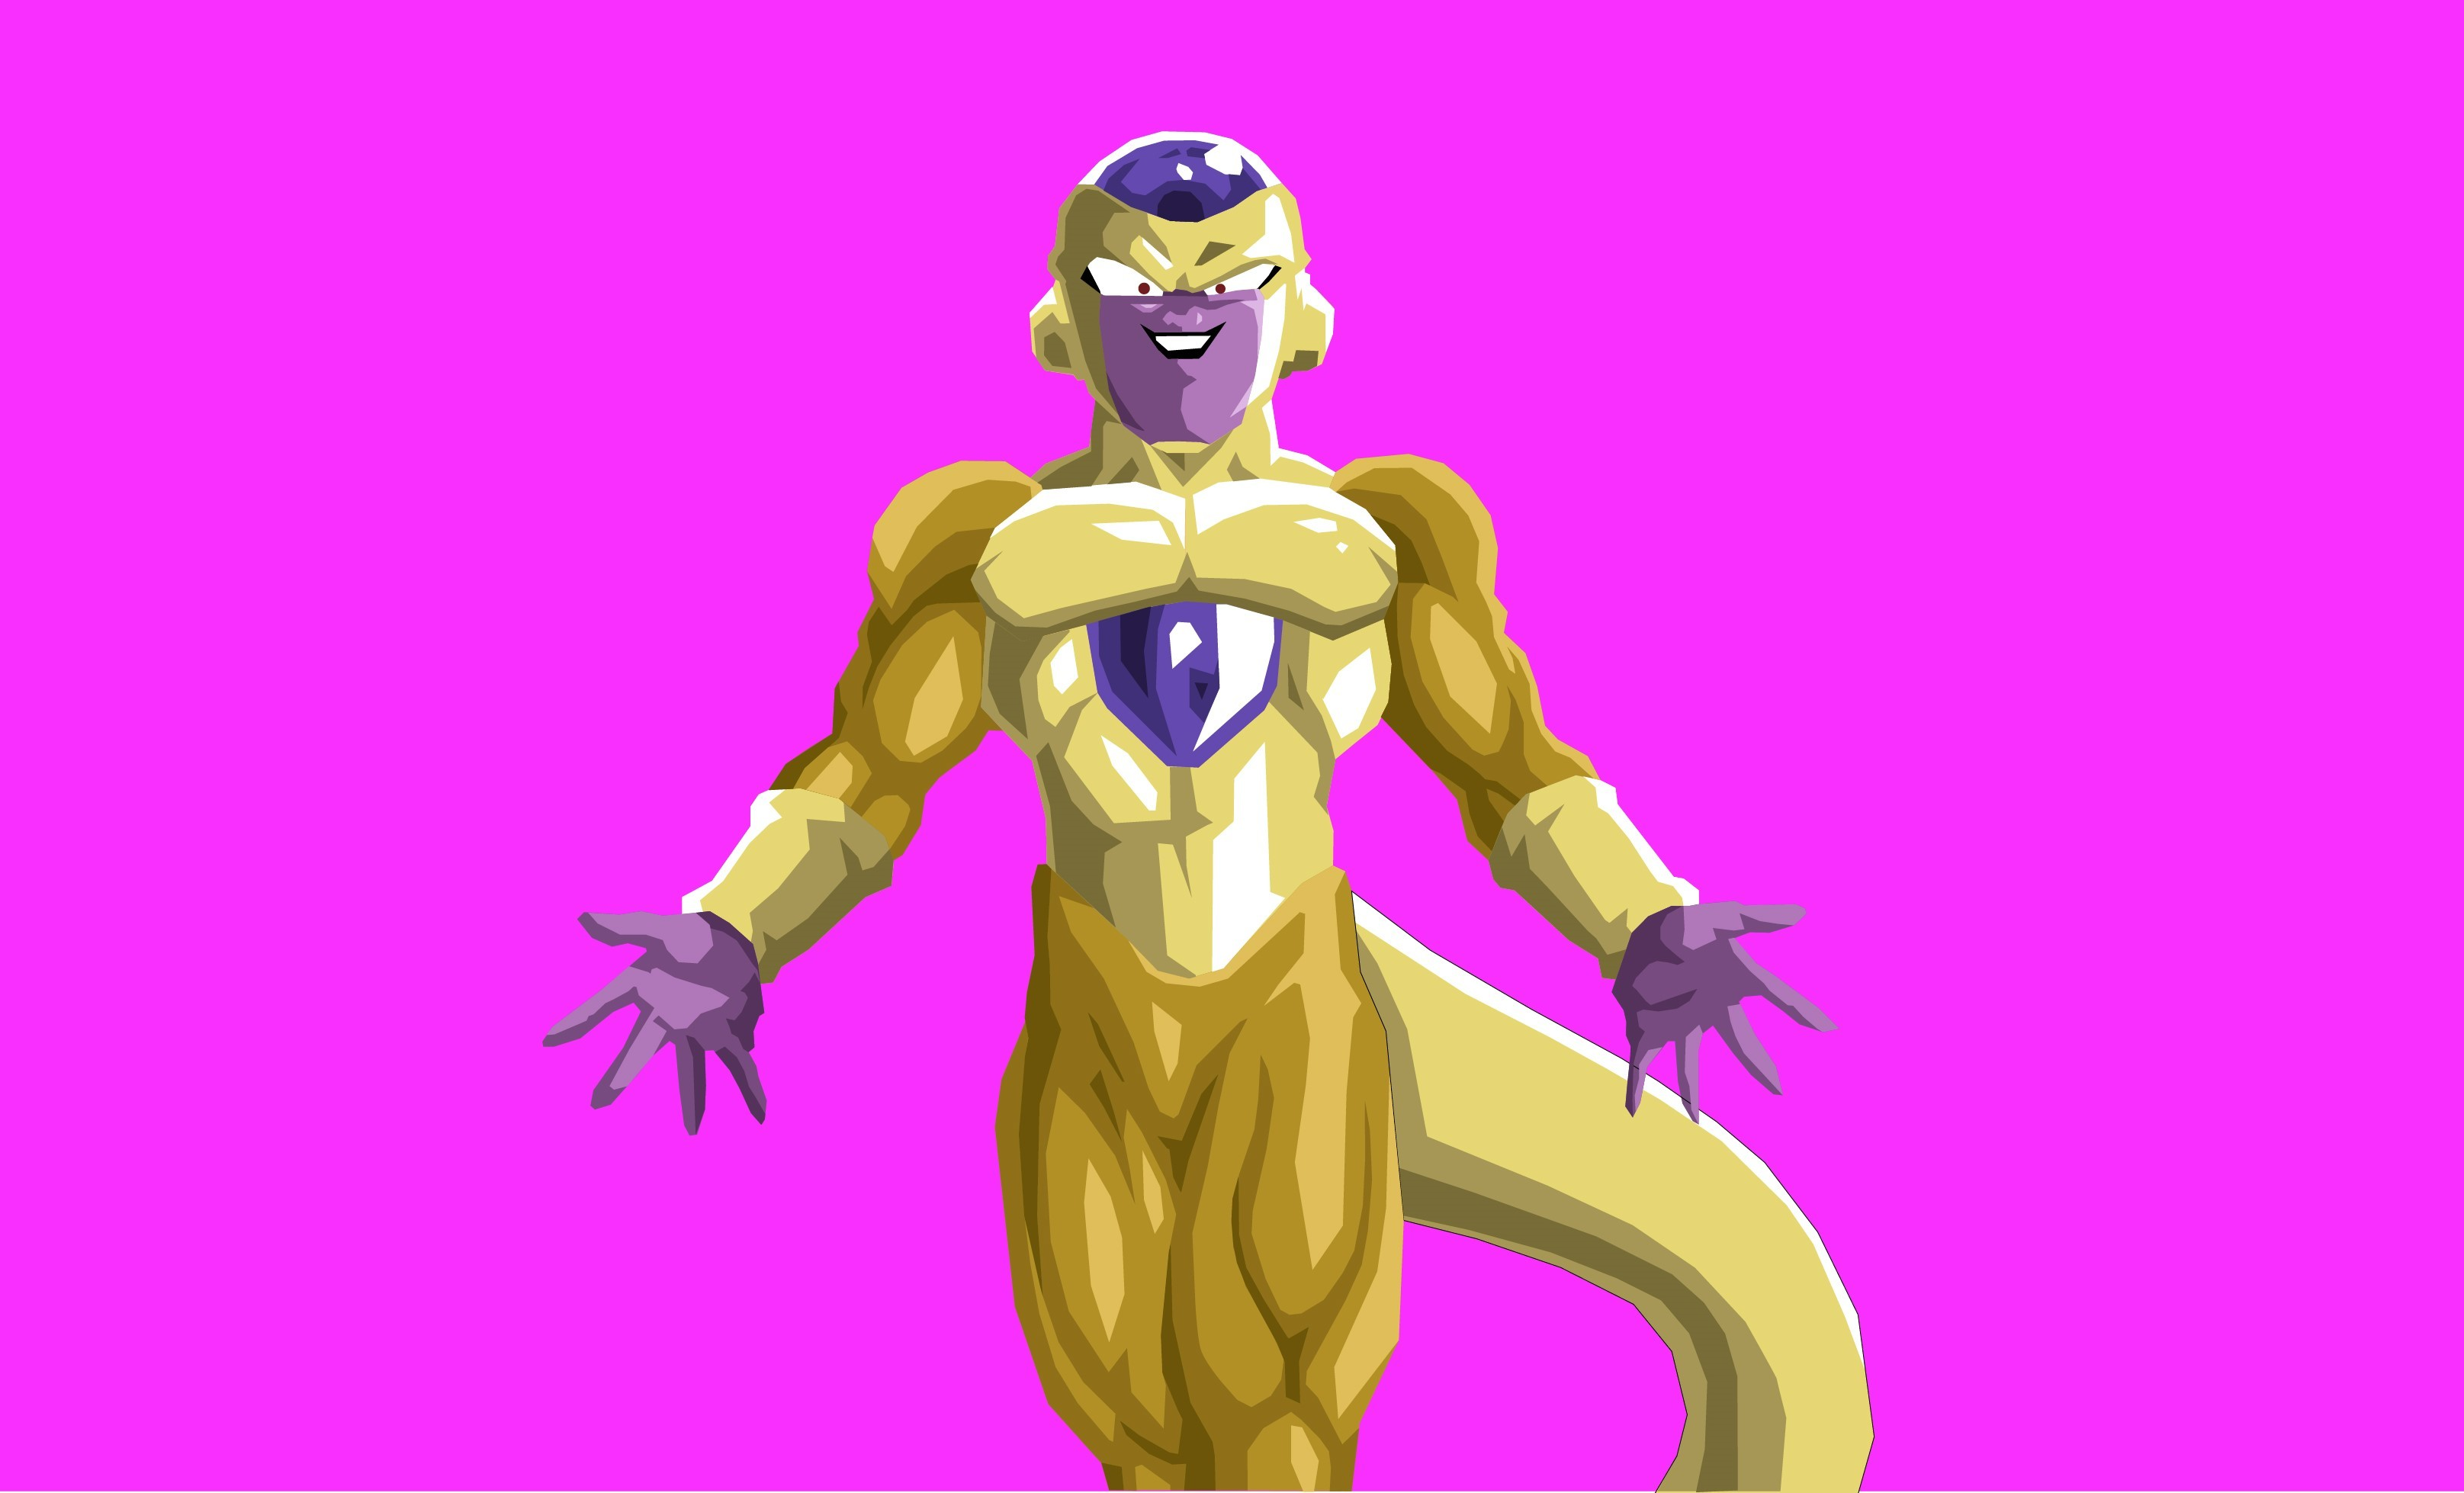 Anime Frieza Dragon Ball Dragon Ball Super Super Saiyan Blue  villains villain Monster (anime